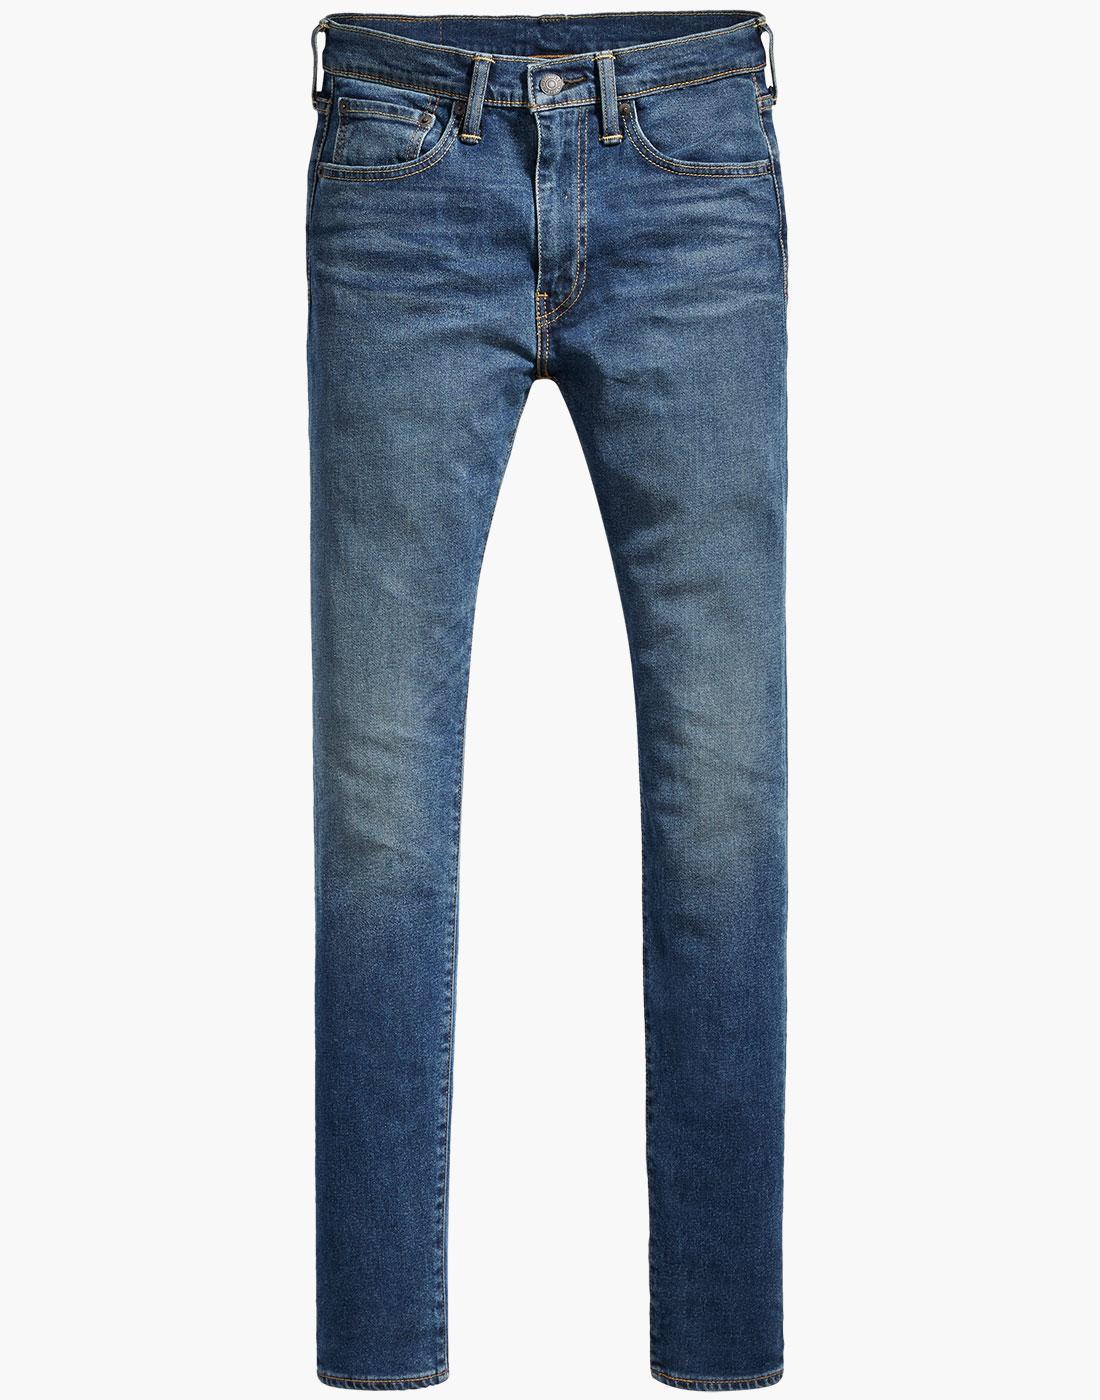 LEVI'S 519 Mod Extreme Skinny Jeans WILLIAMSBURG